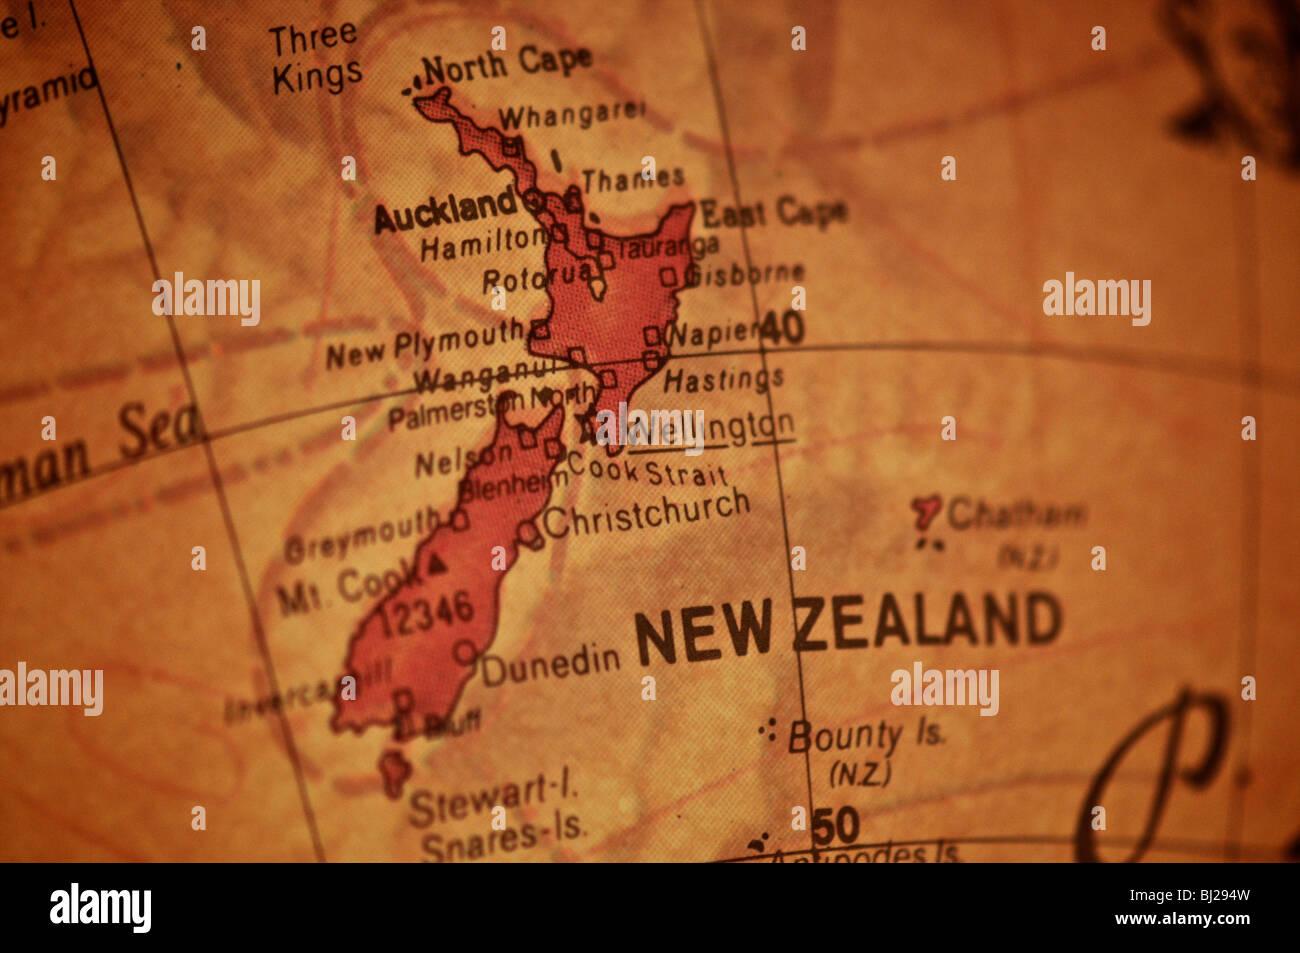 Neuseeland Detail: Neuseeland Karte Stockfotos & Neuseeland Karte Bilder